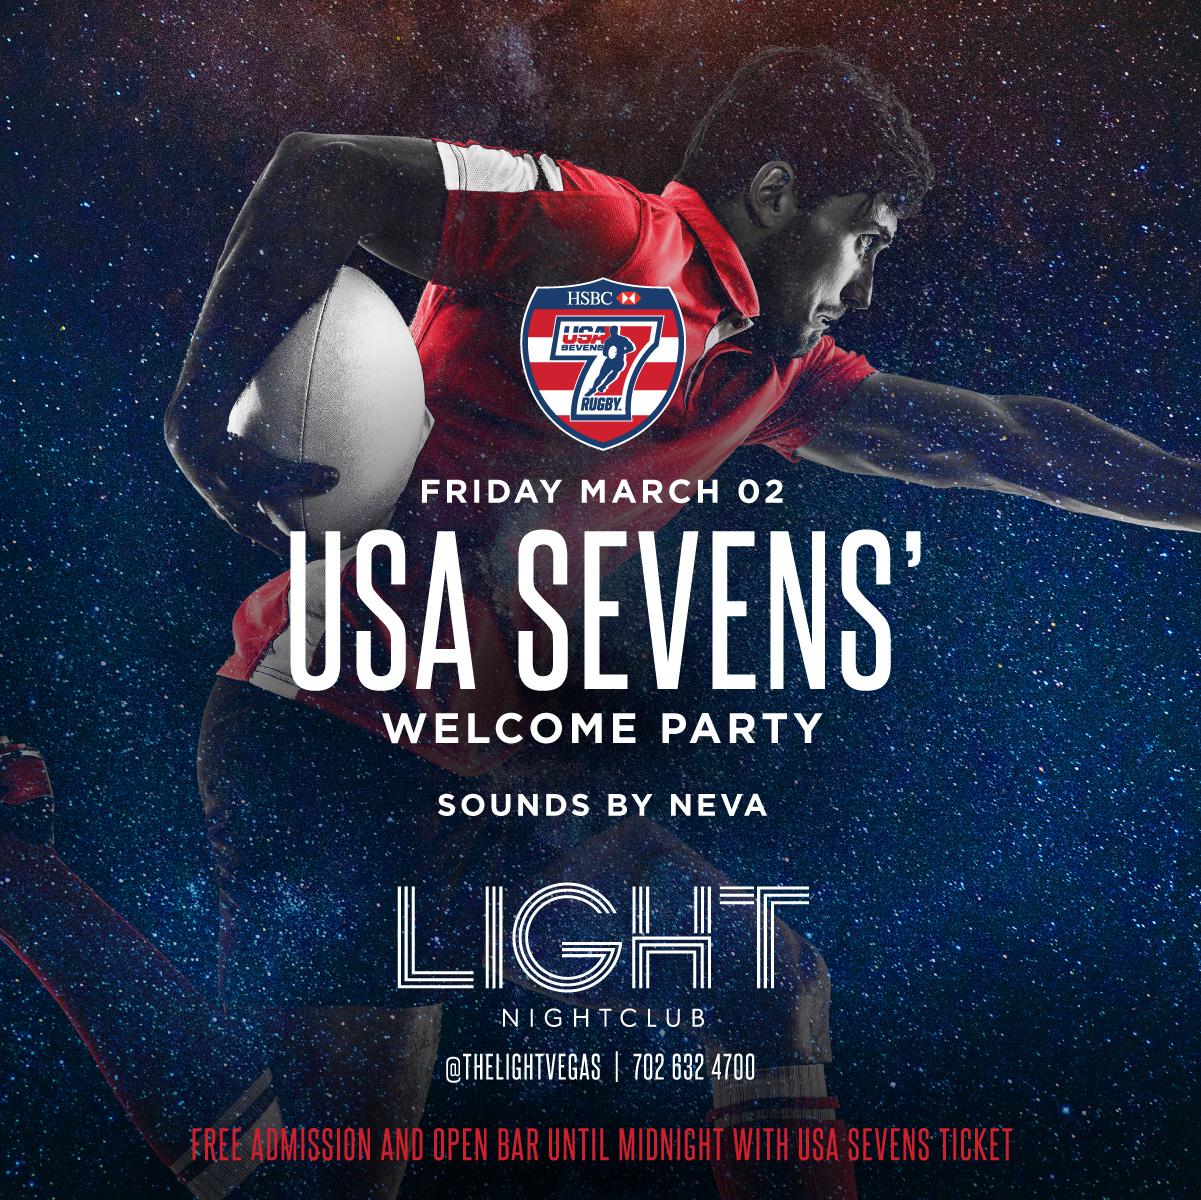 USA SEVENS Tickets 03/02/18